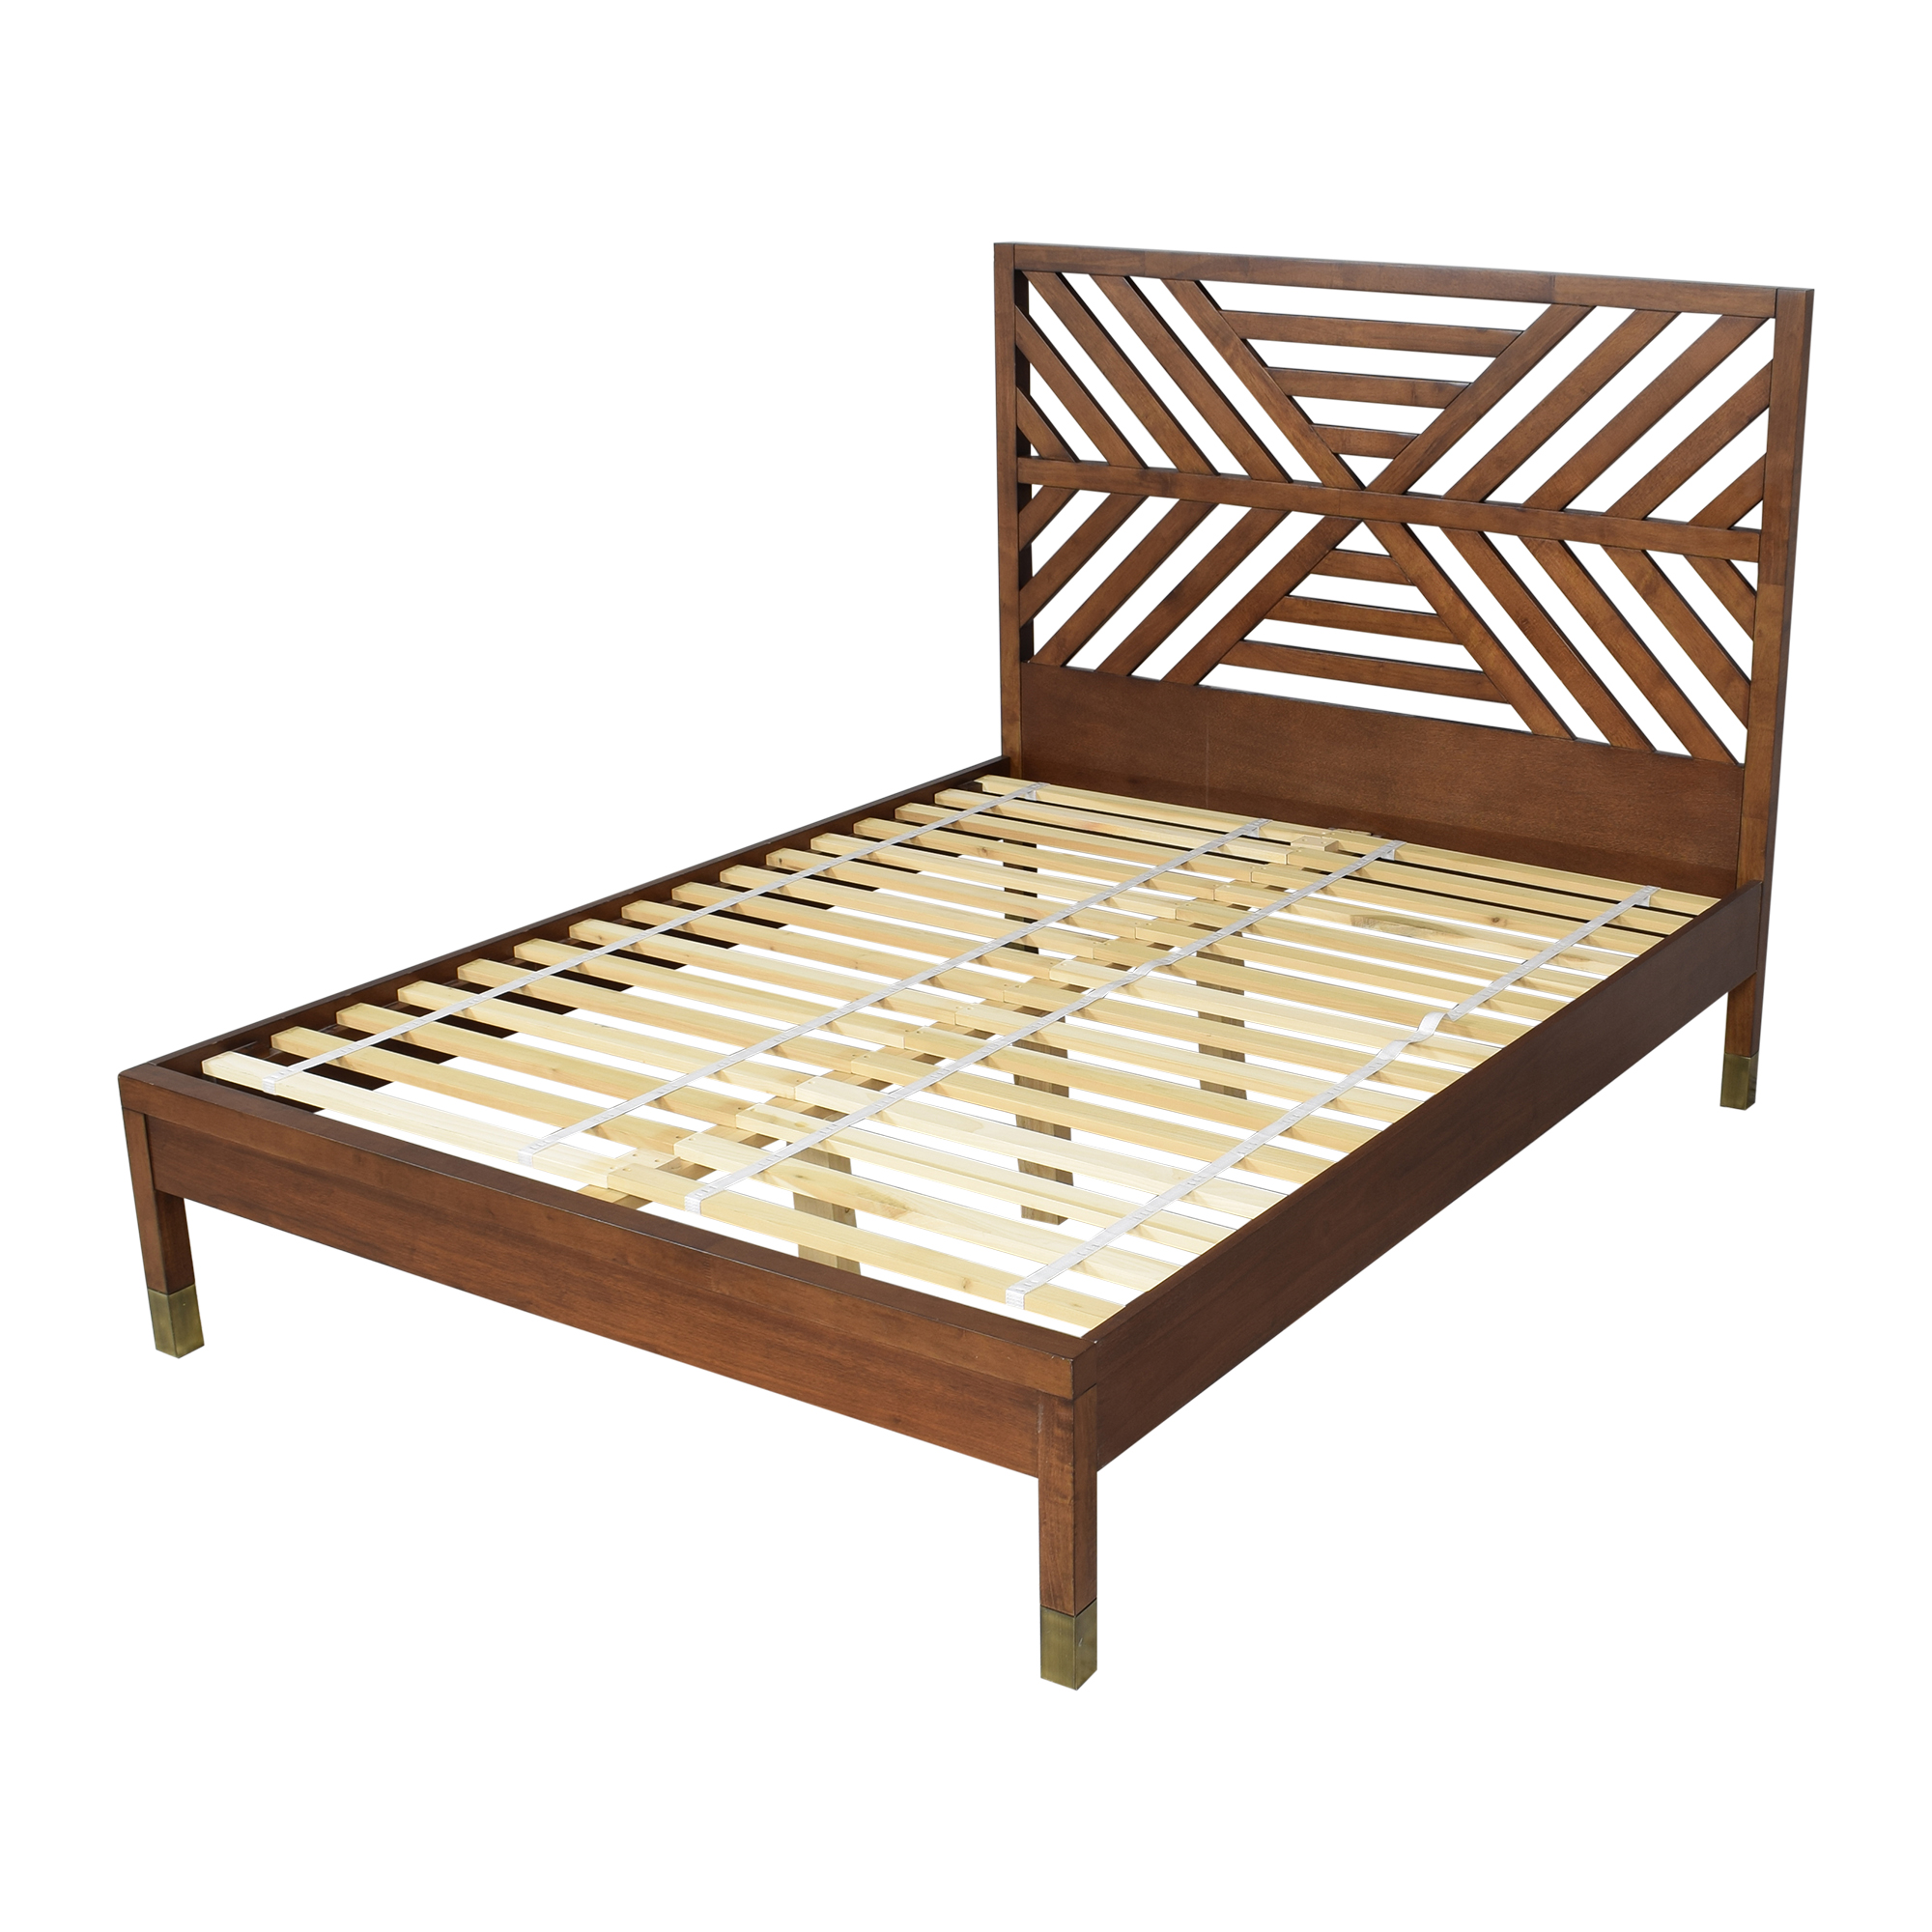 West Elm West Elm Vonnegut/Kraft Queen Bed on sale